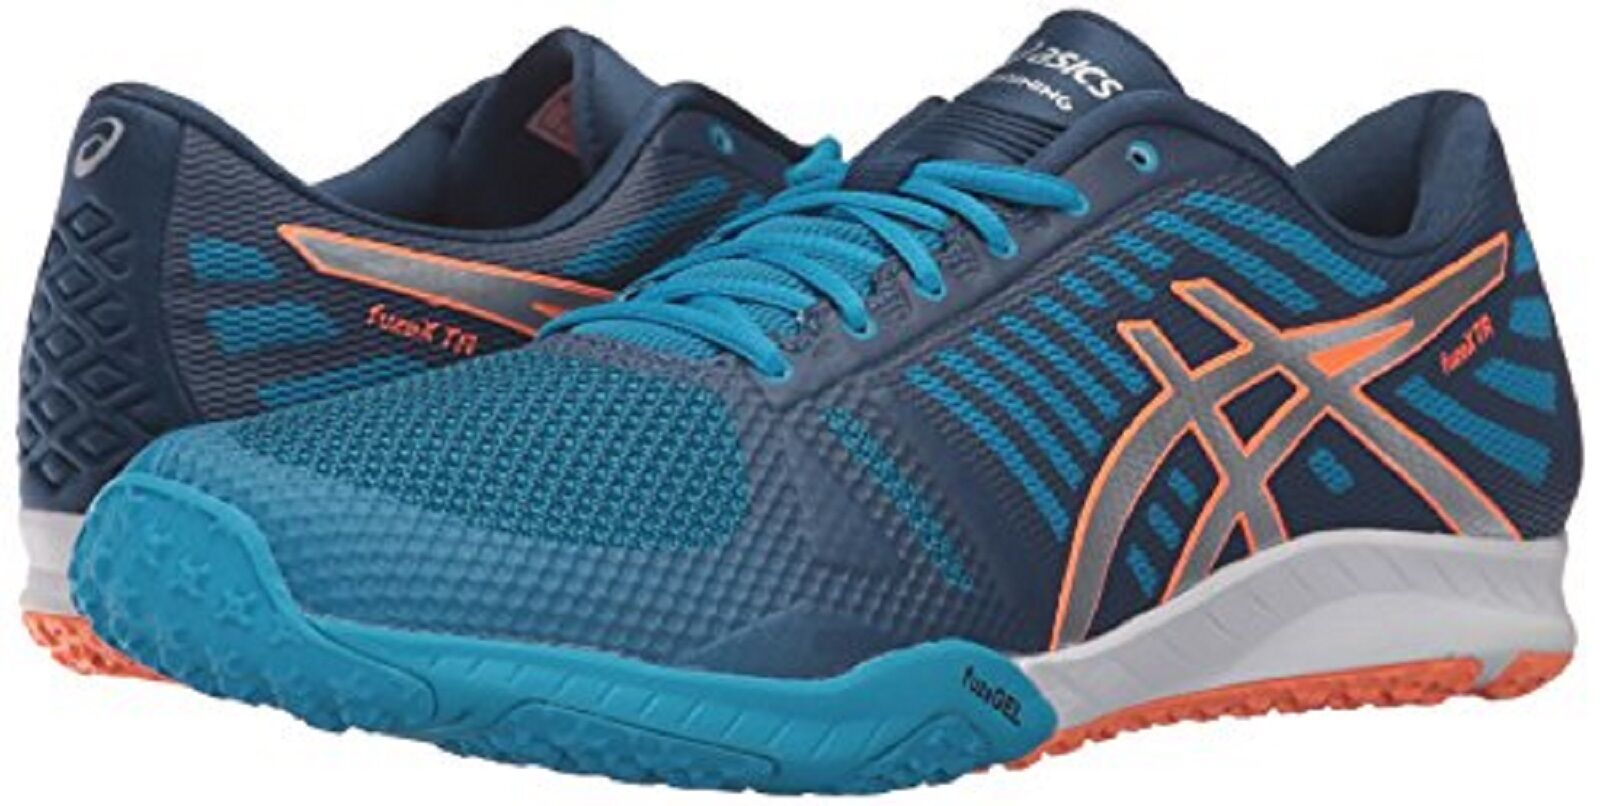 ASICS fuzeX TR (S613N) Cross-Zapatilla Zapato De Hombre Azul Plata Naranja M Nuevo en Caja